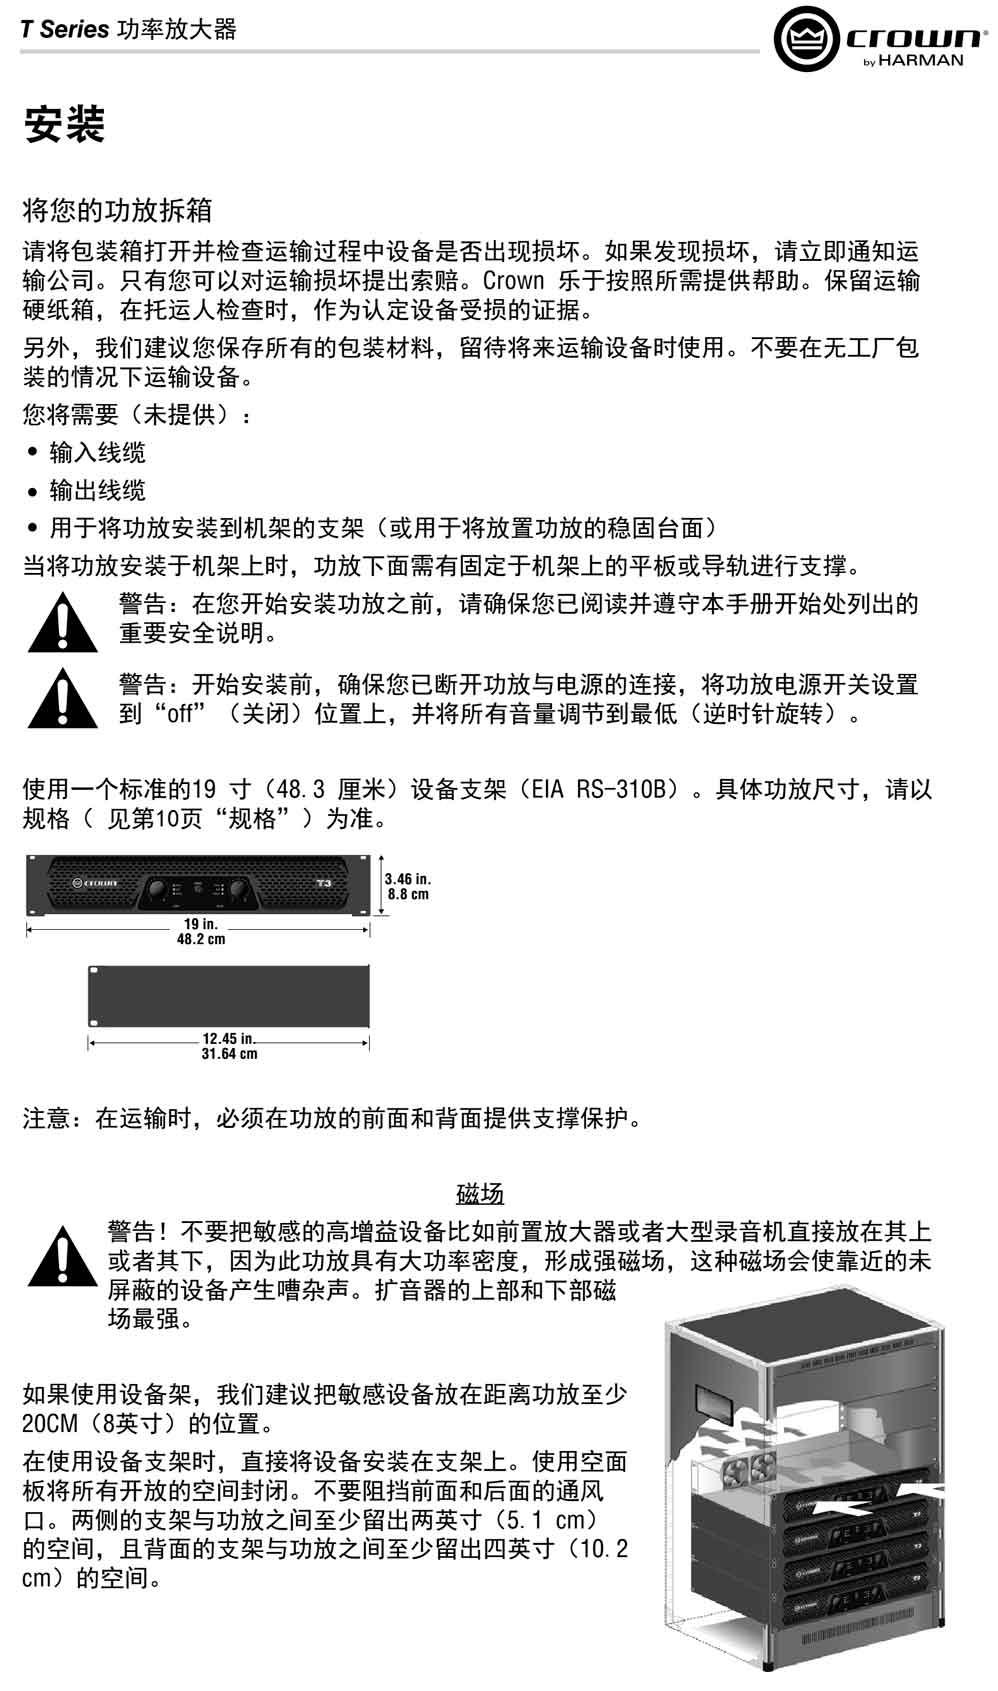 Crown 皇冠 T3 T5 T7 T10 功放說明書 娛樂功放 皇冠功放 演出功放 進口功放